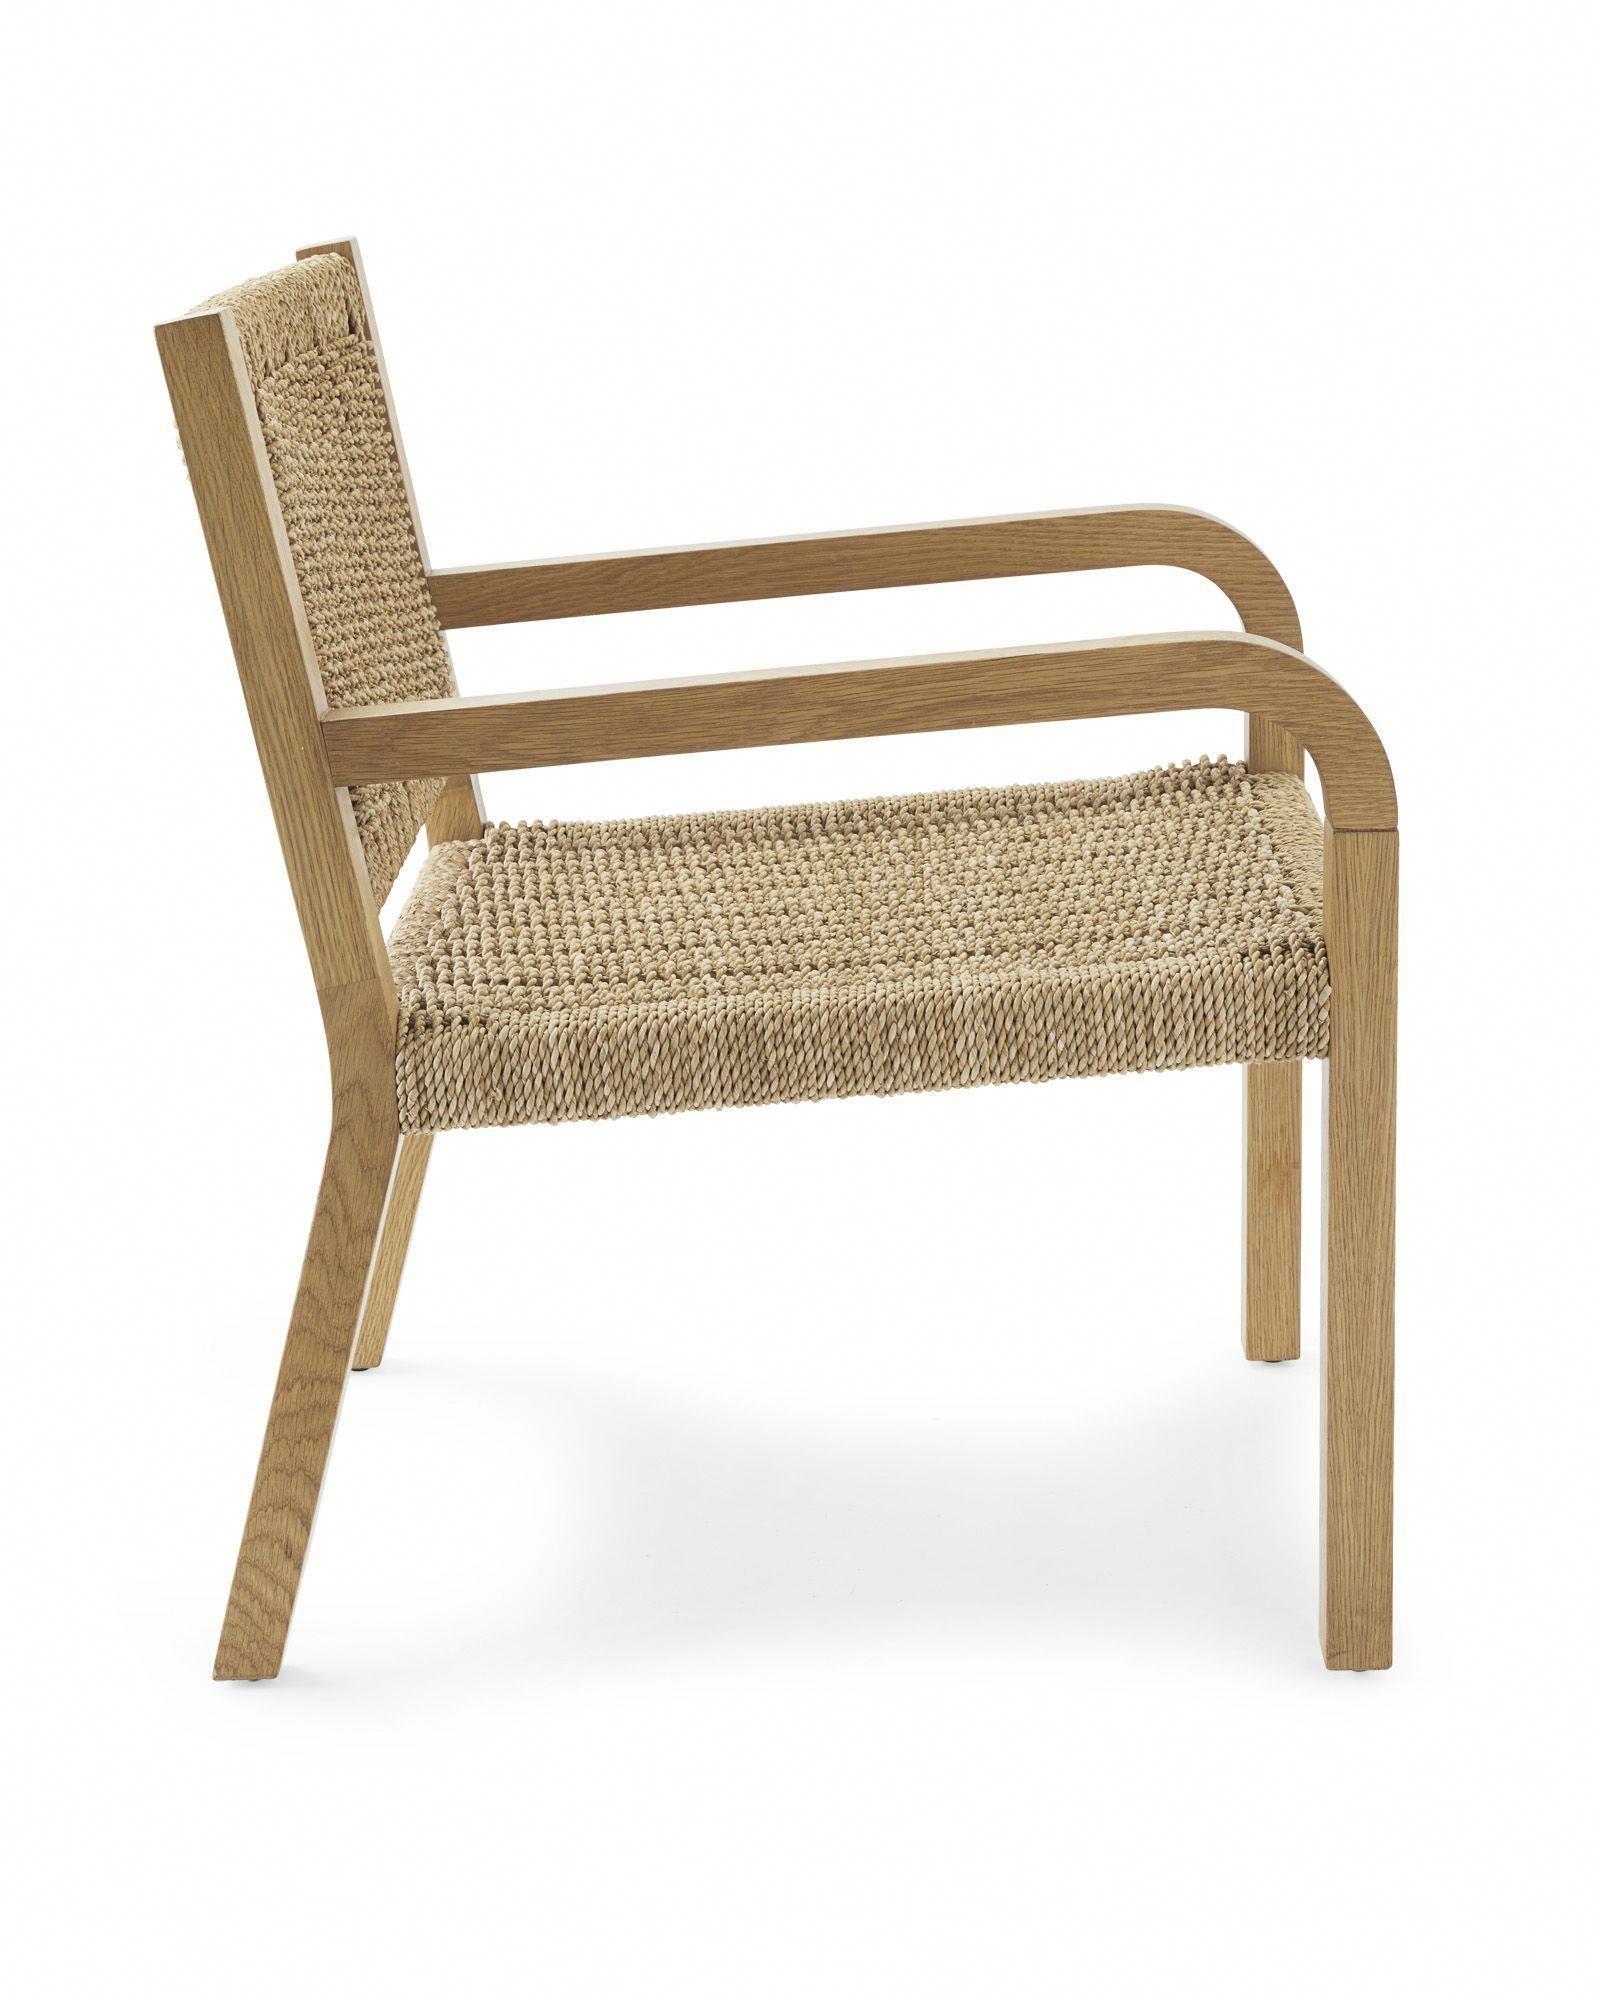 Portland Rope Chairportland Chair Adirondackchairs